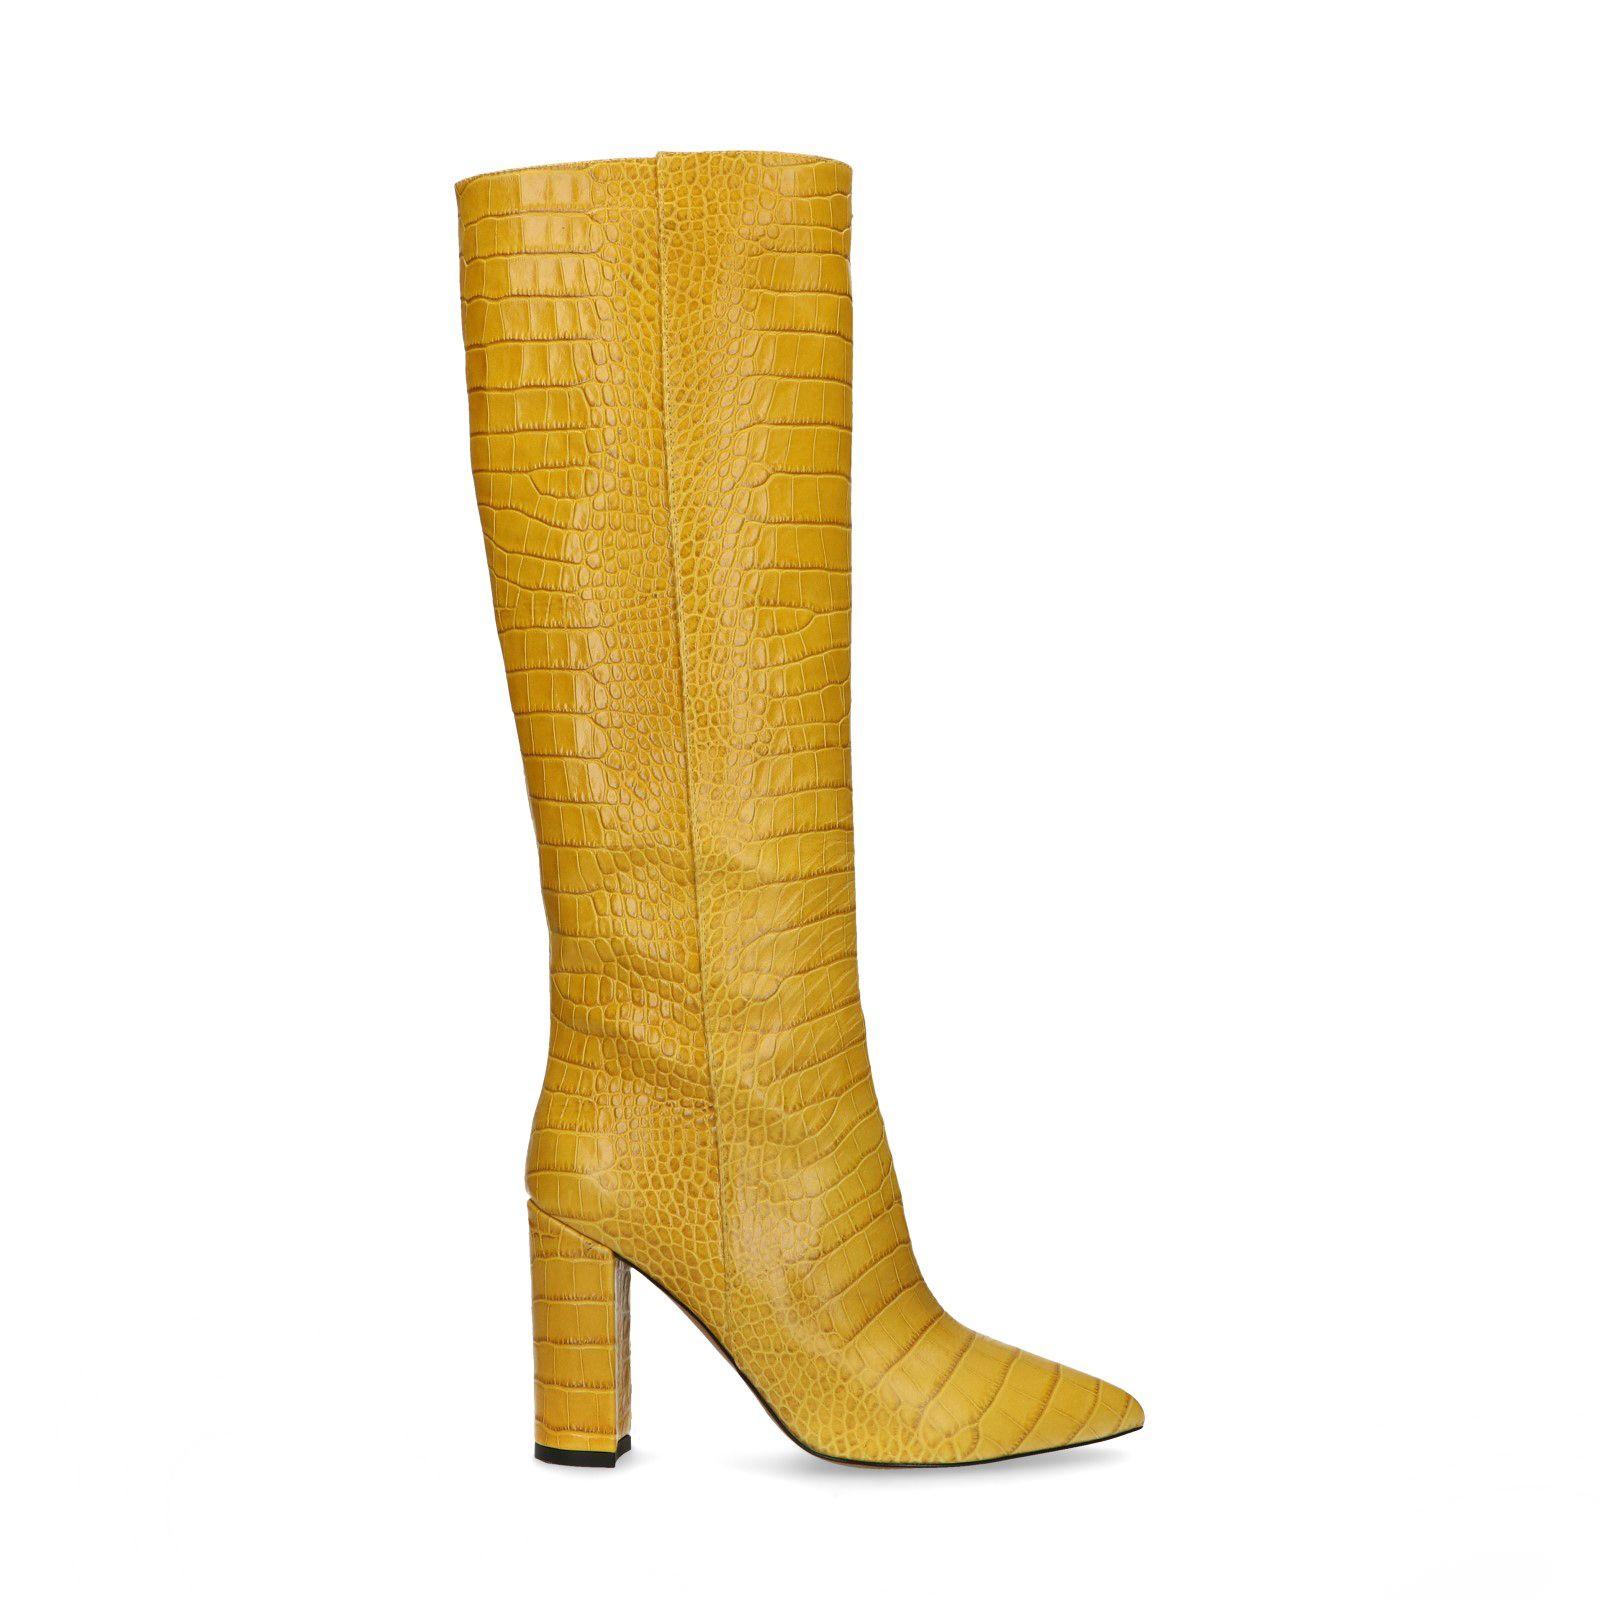 Hoge gele laarzen met crocoprint Dames | MANFIELD